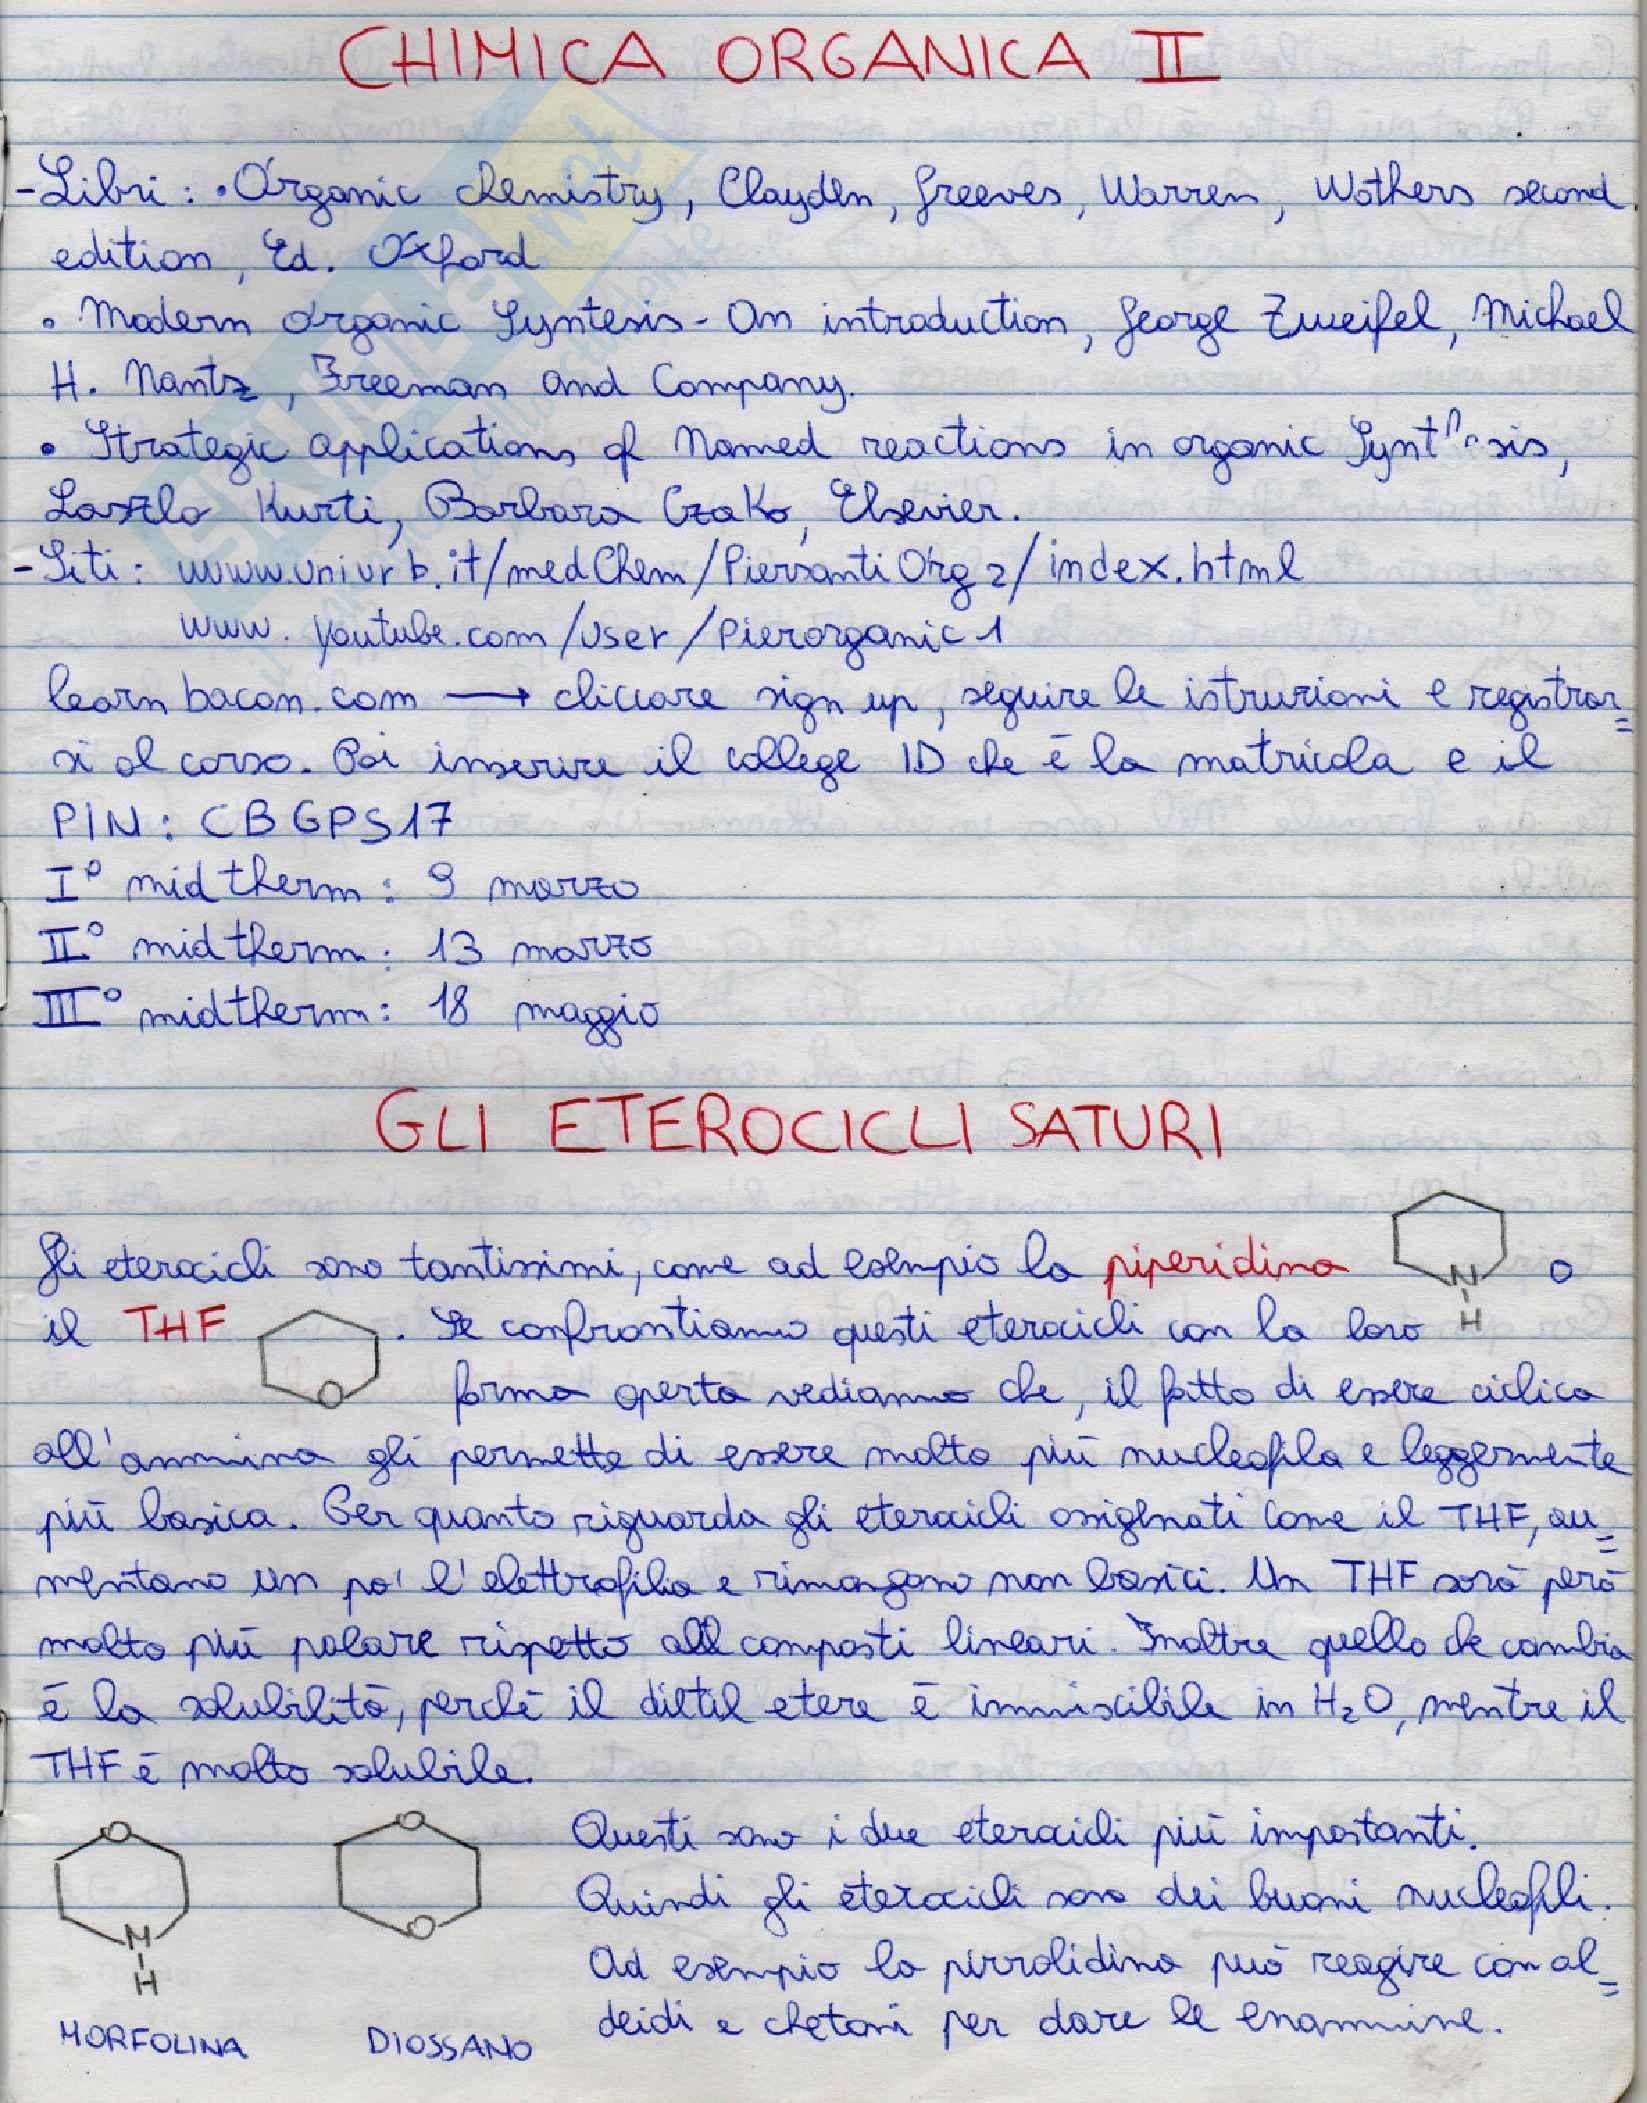 Chimica organica II